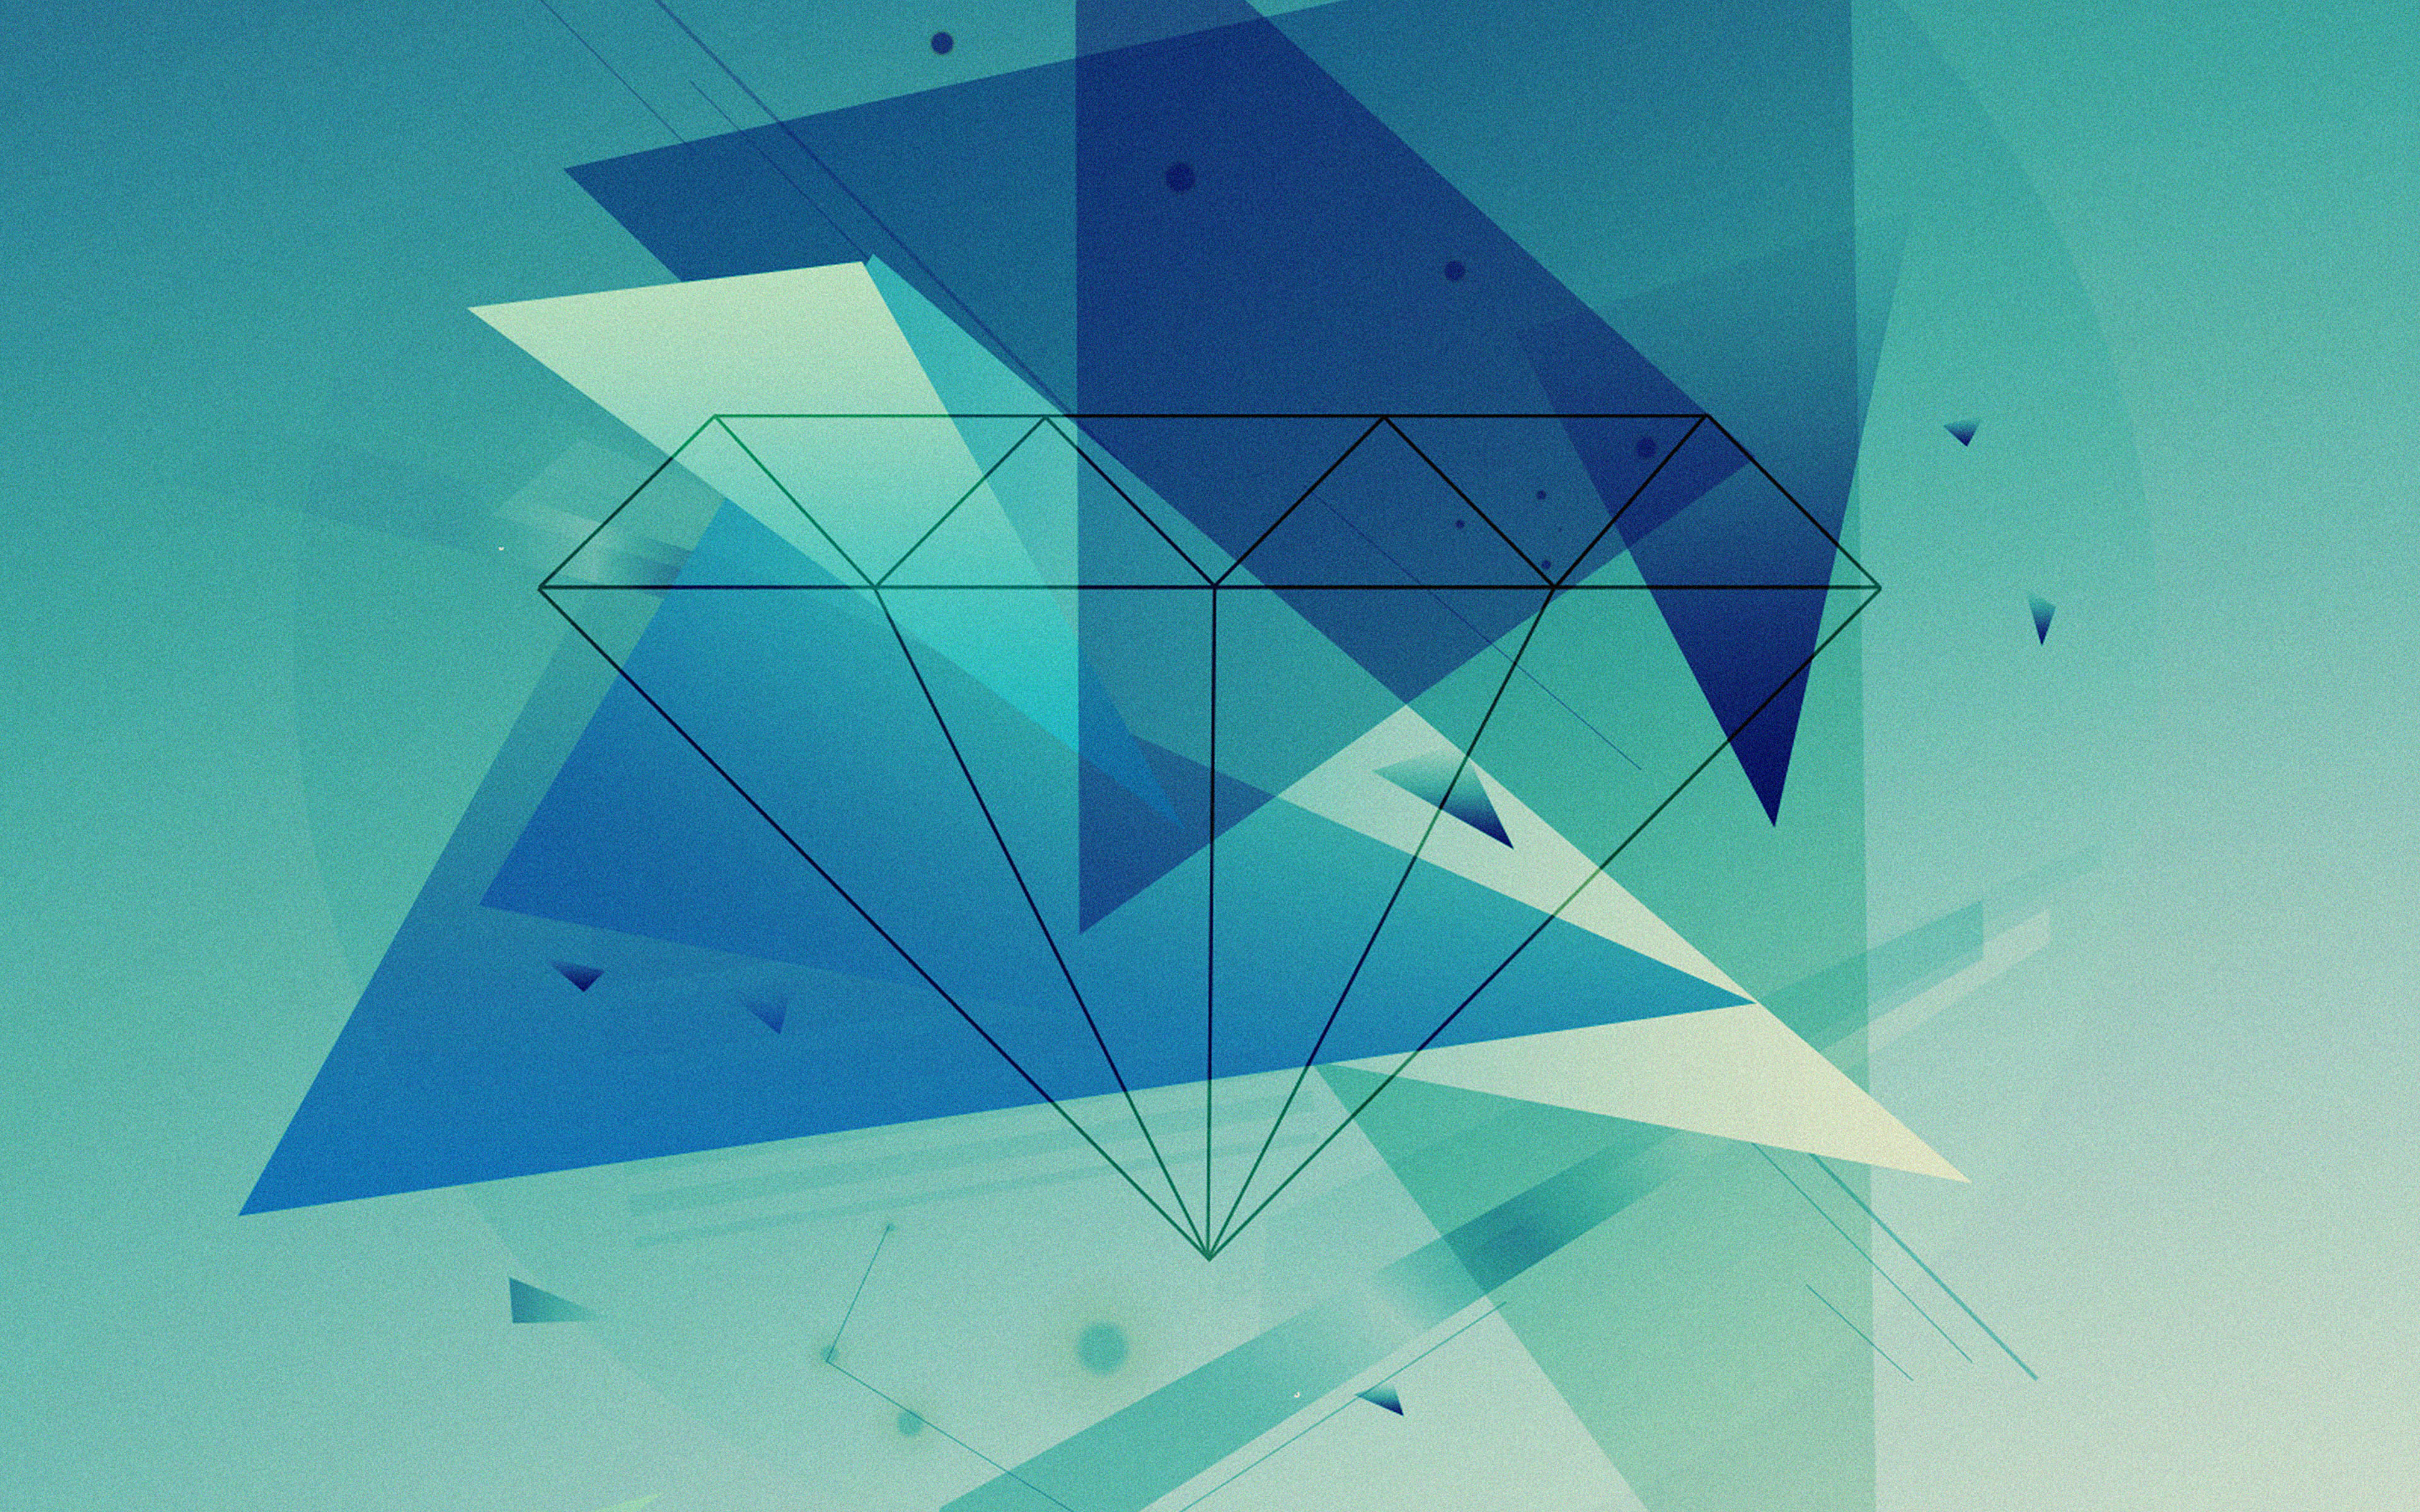 Vb89 Wallpaper Diamond Blue Illust Graphic Art Wallpaper